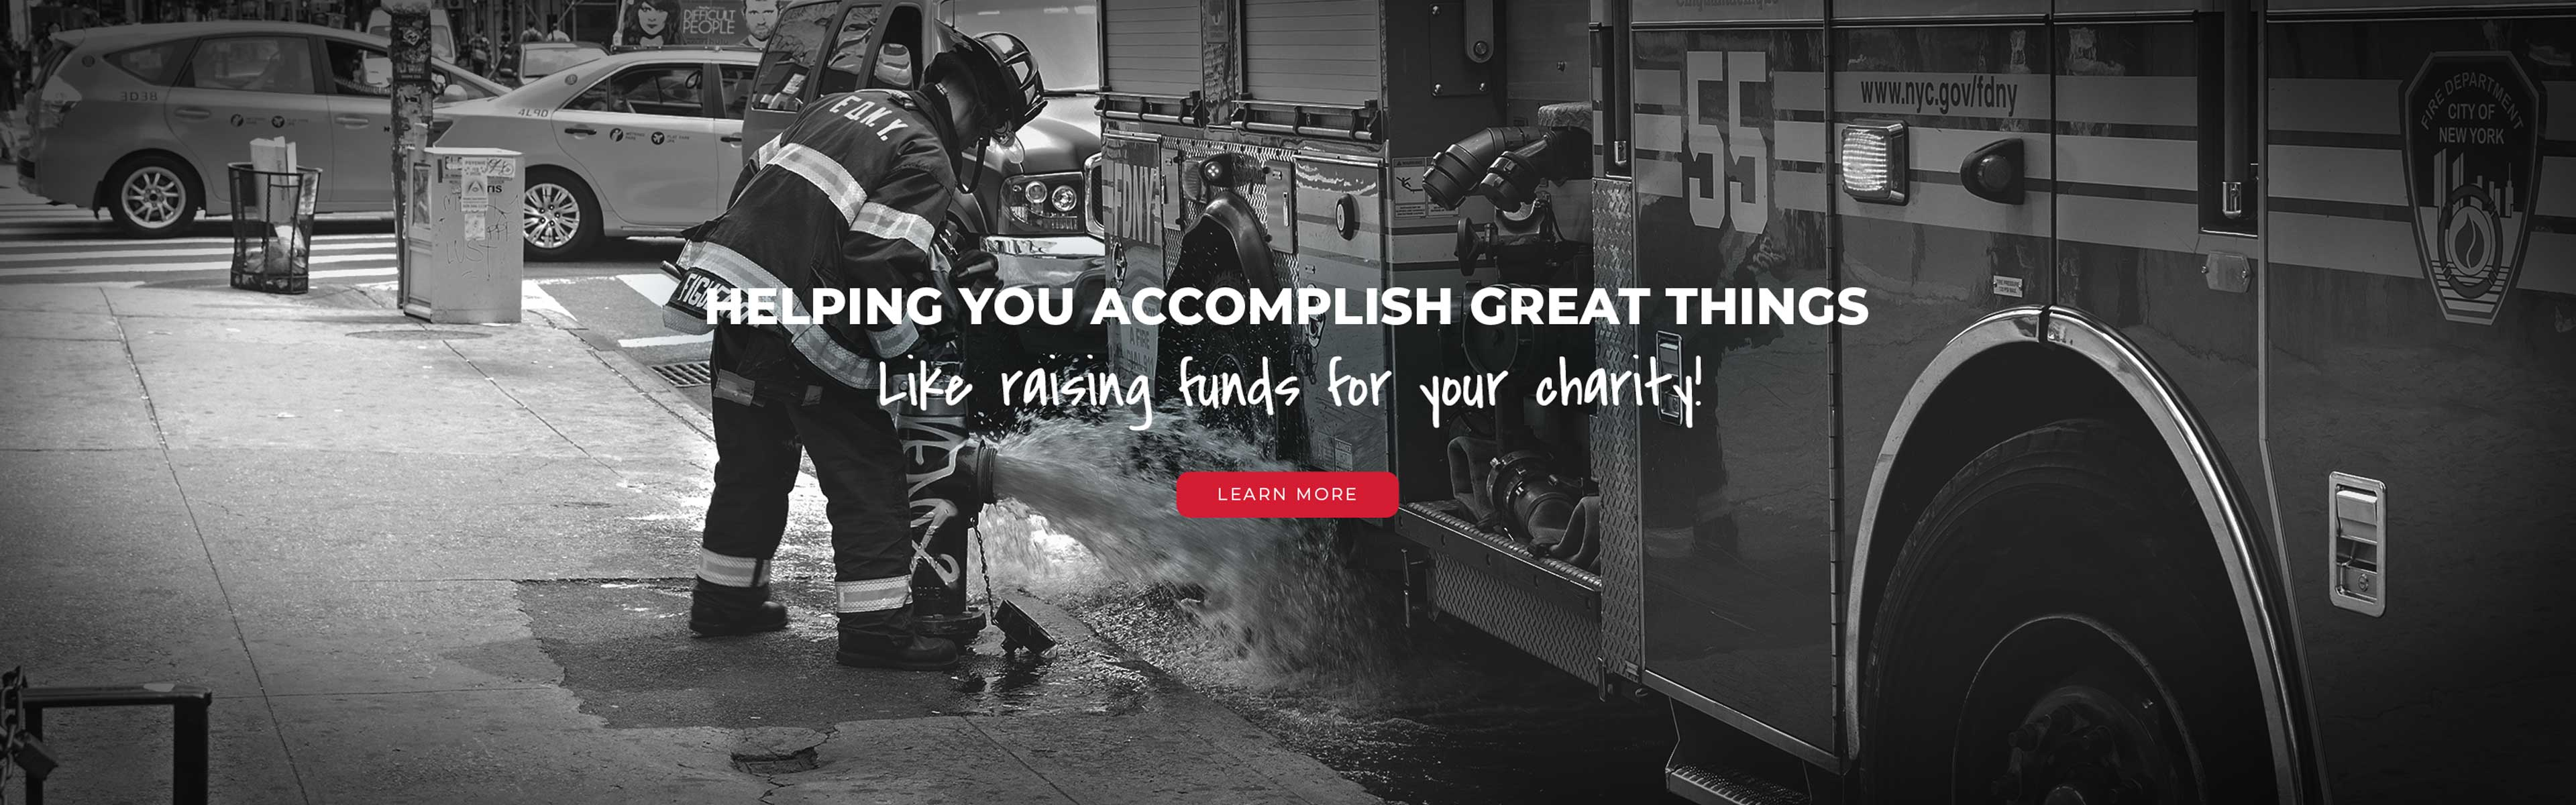 Bingo Raises Funds for Charity